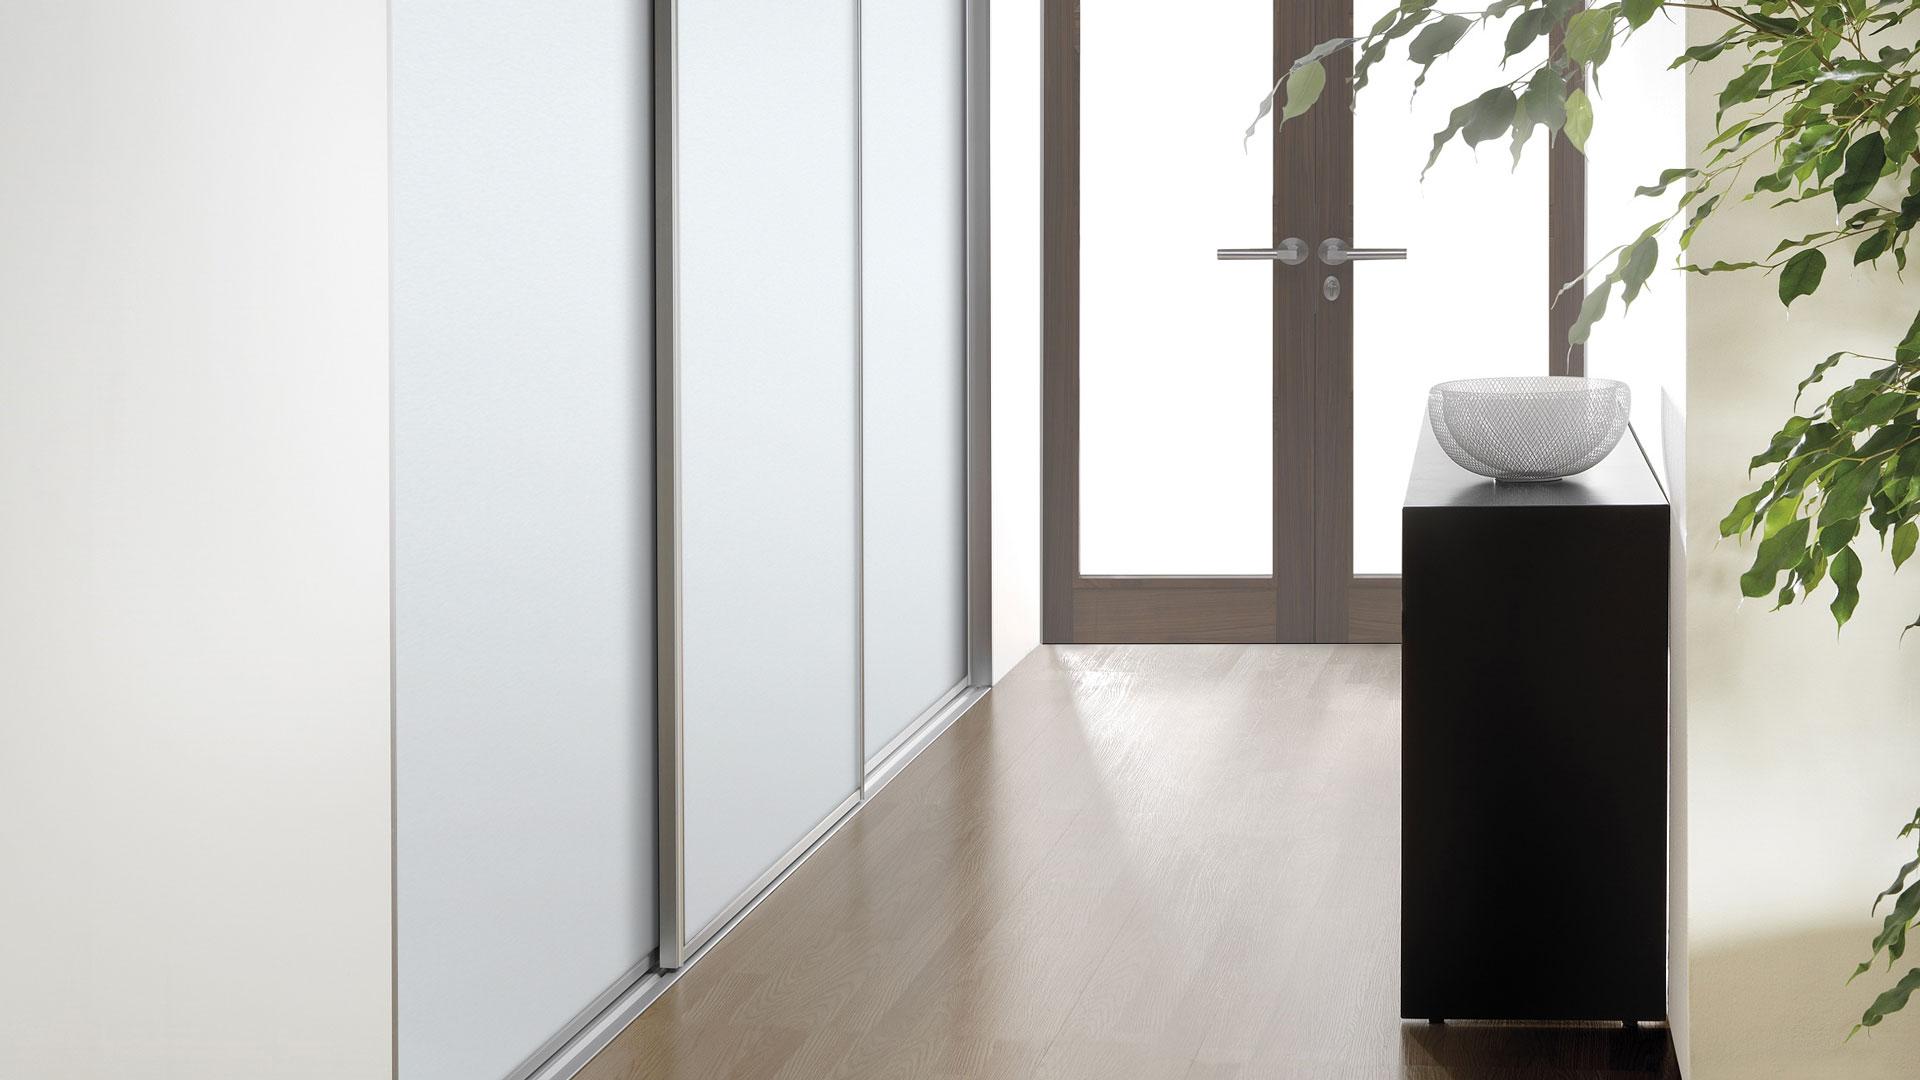 Deco Trim hallway wardrobe door system